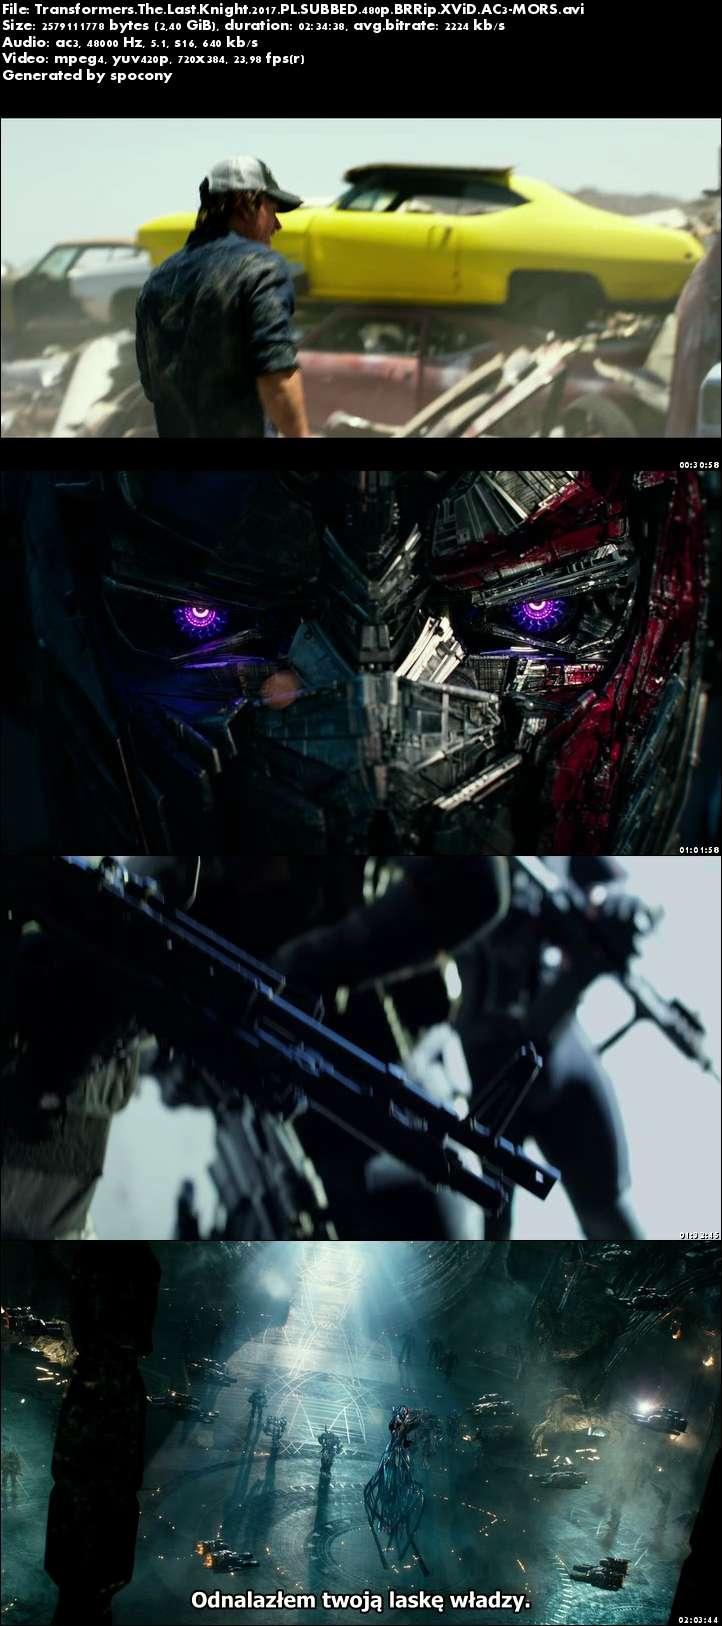 Transformers: Ostatni Rycerz / Transformers The Last Knight (2017) PL.SUBBED.480p.BRRip.XViD.AC3-MORS [Napisy PL]